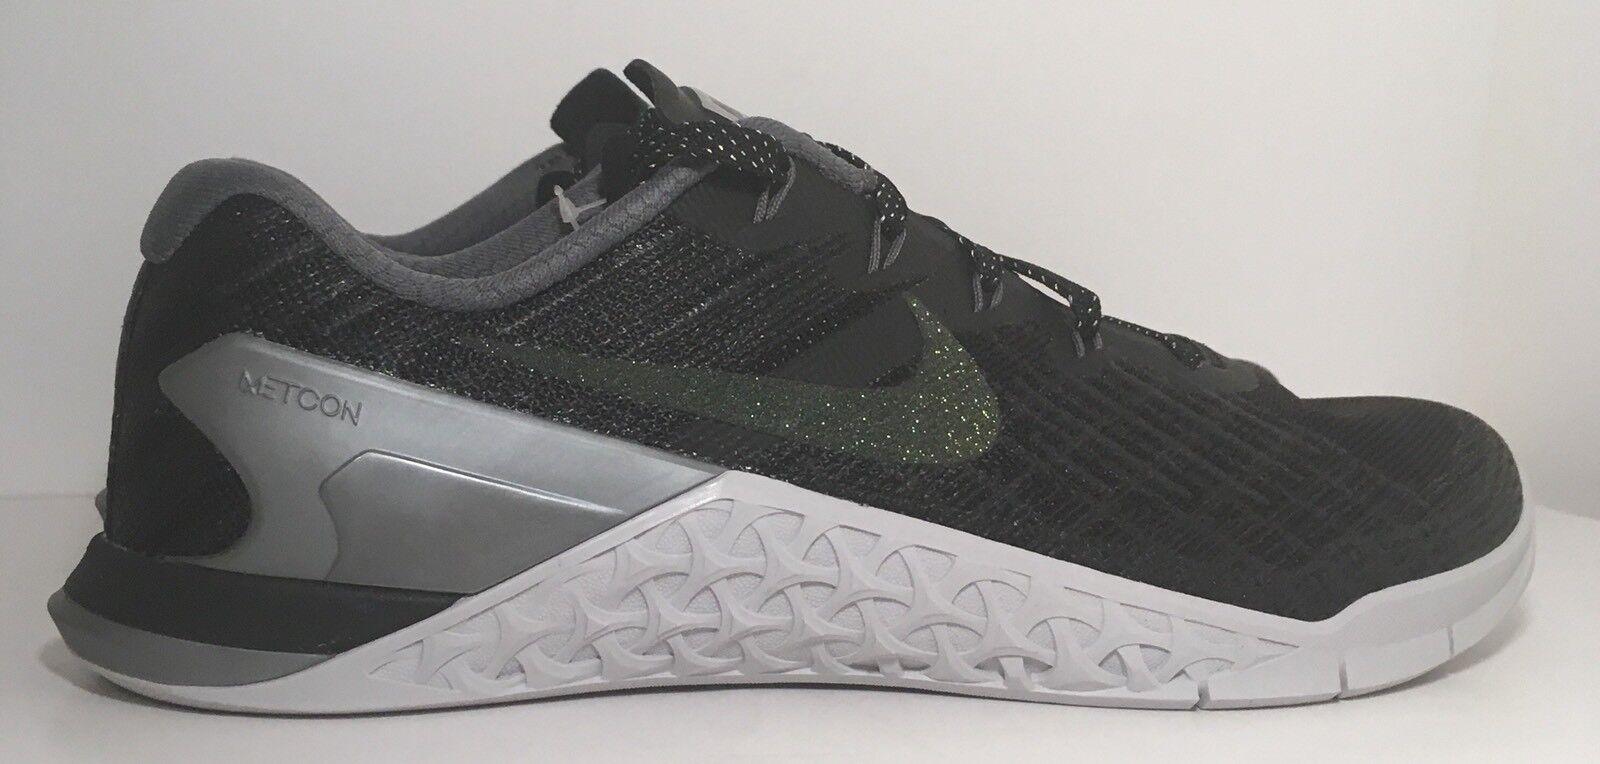 SZ.10.5 Women's  Nike Metcon 3 Metallic 922880-001  Black/MultiColor